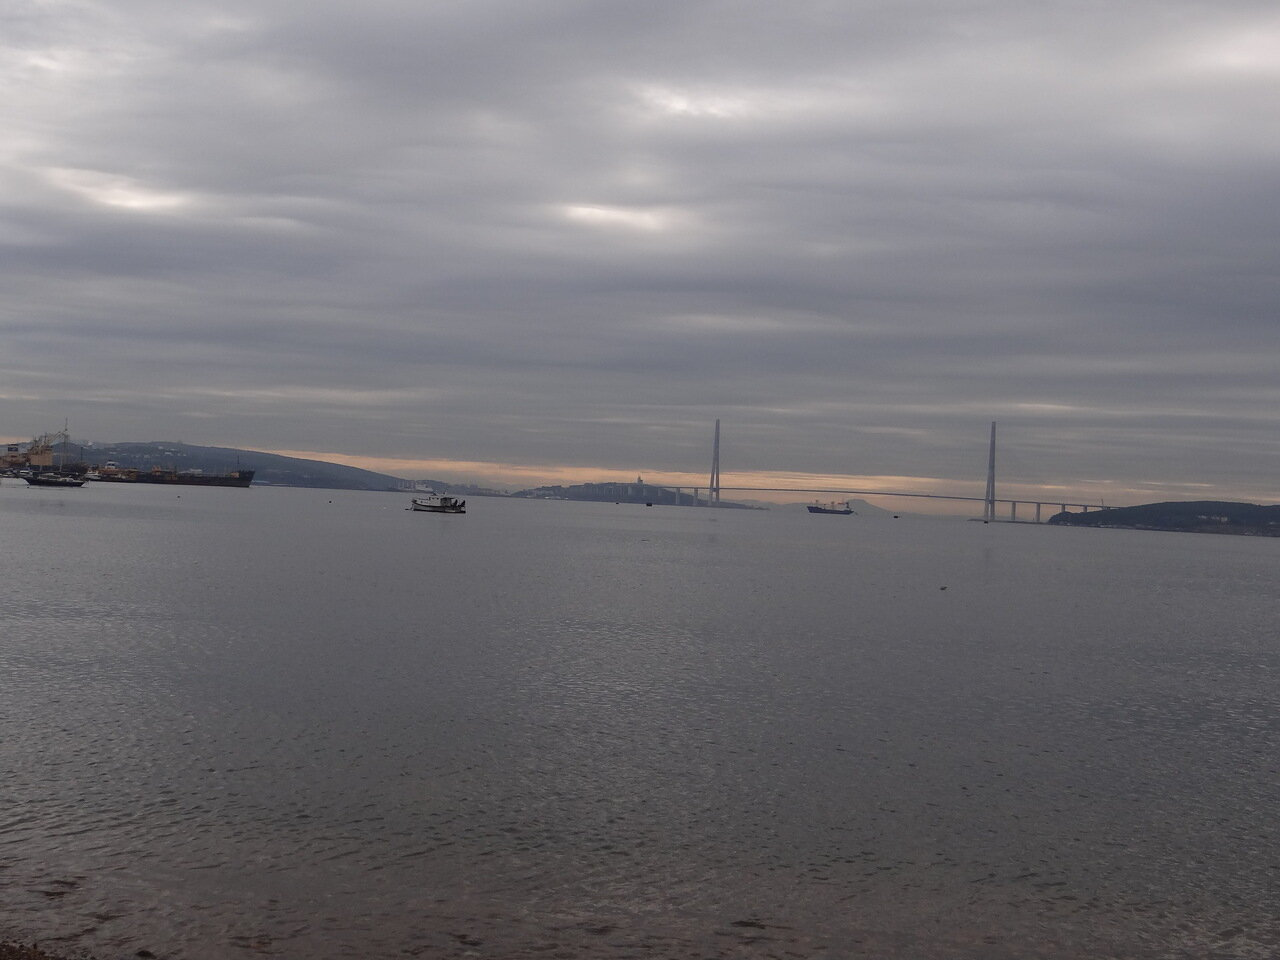 Vladivostok. Water area. Bridge. 符拉迪沃斯托克。水域面積。大橋。